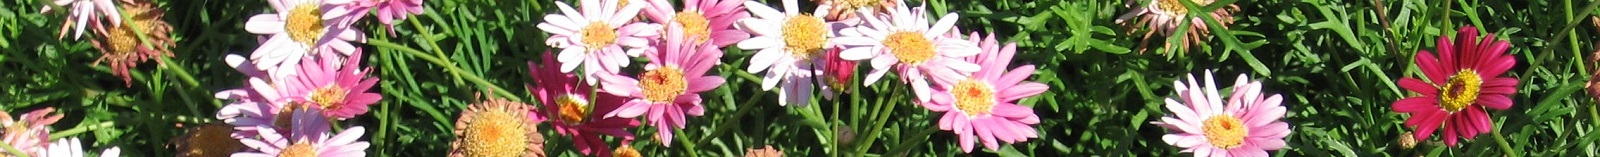 Mini Aster Flowers